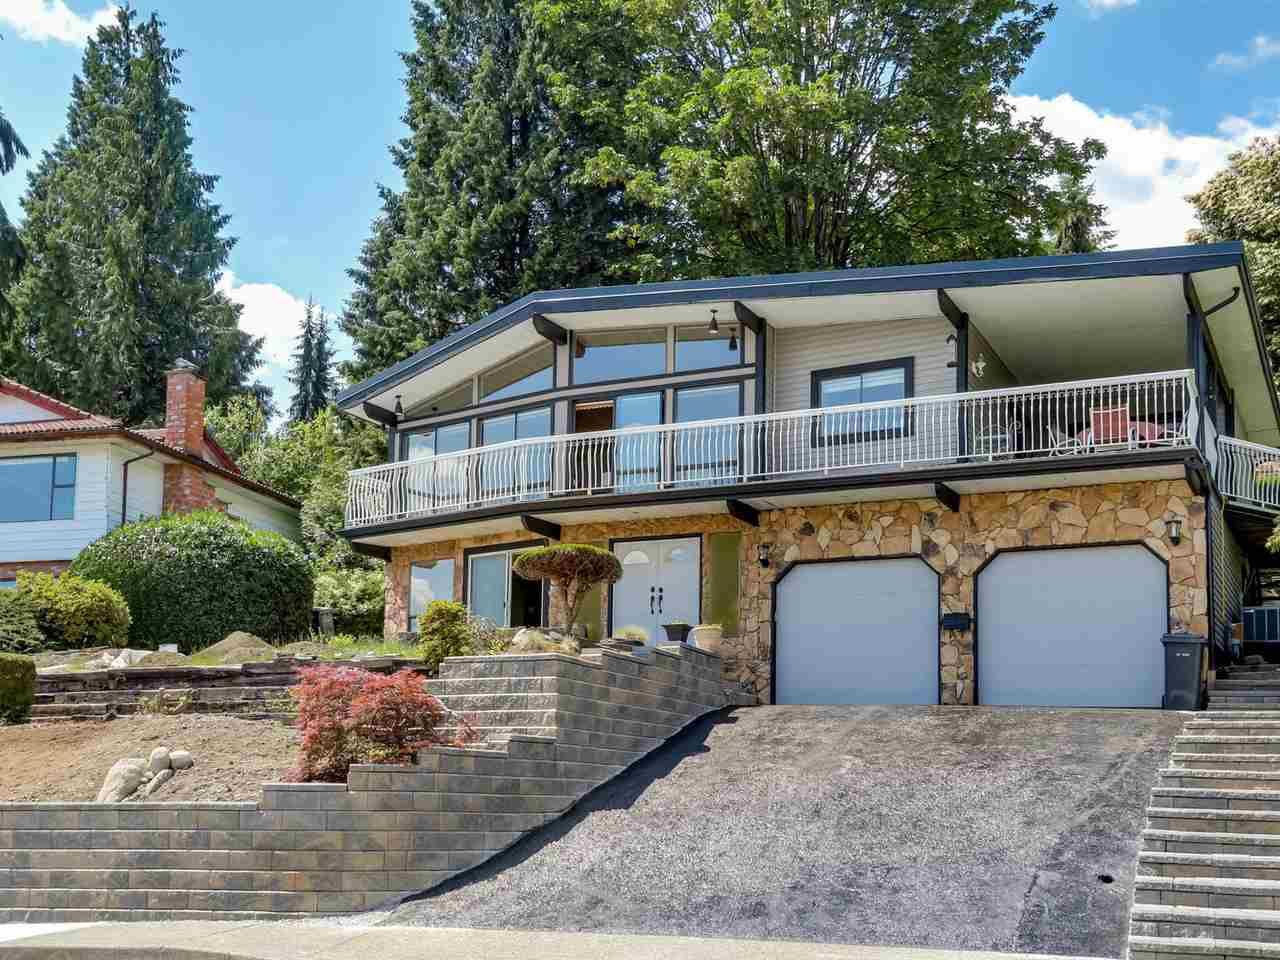 Main Photo: 831 REDDINGTON Court in Coquitlam: Ranch Park House for sale : MLS®# R2074276